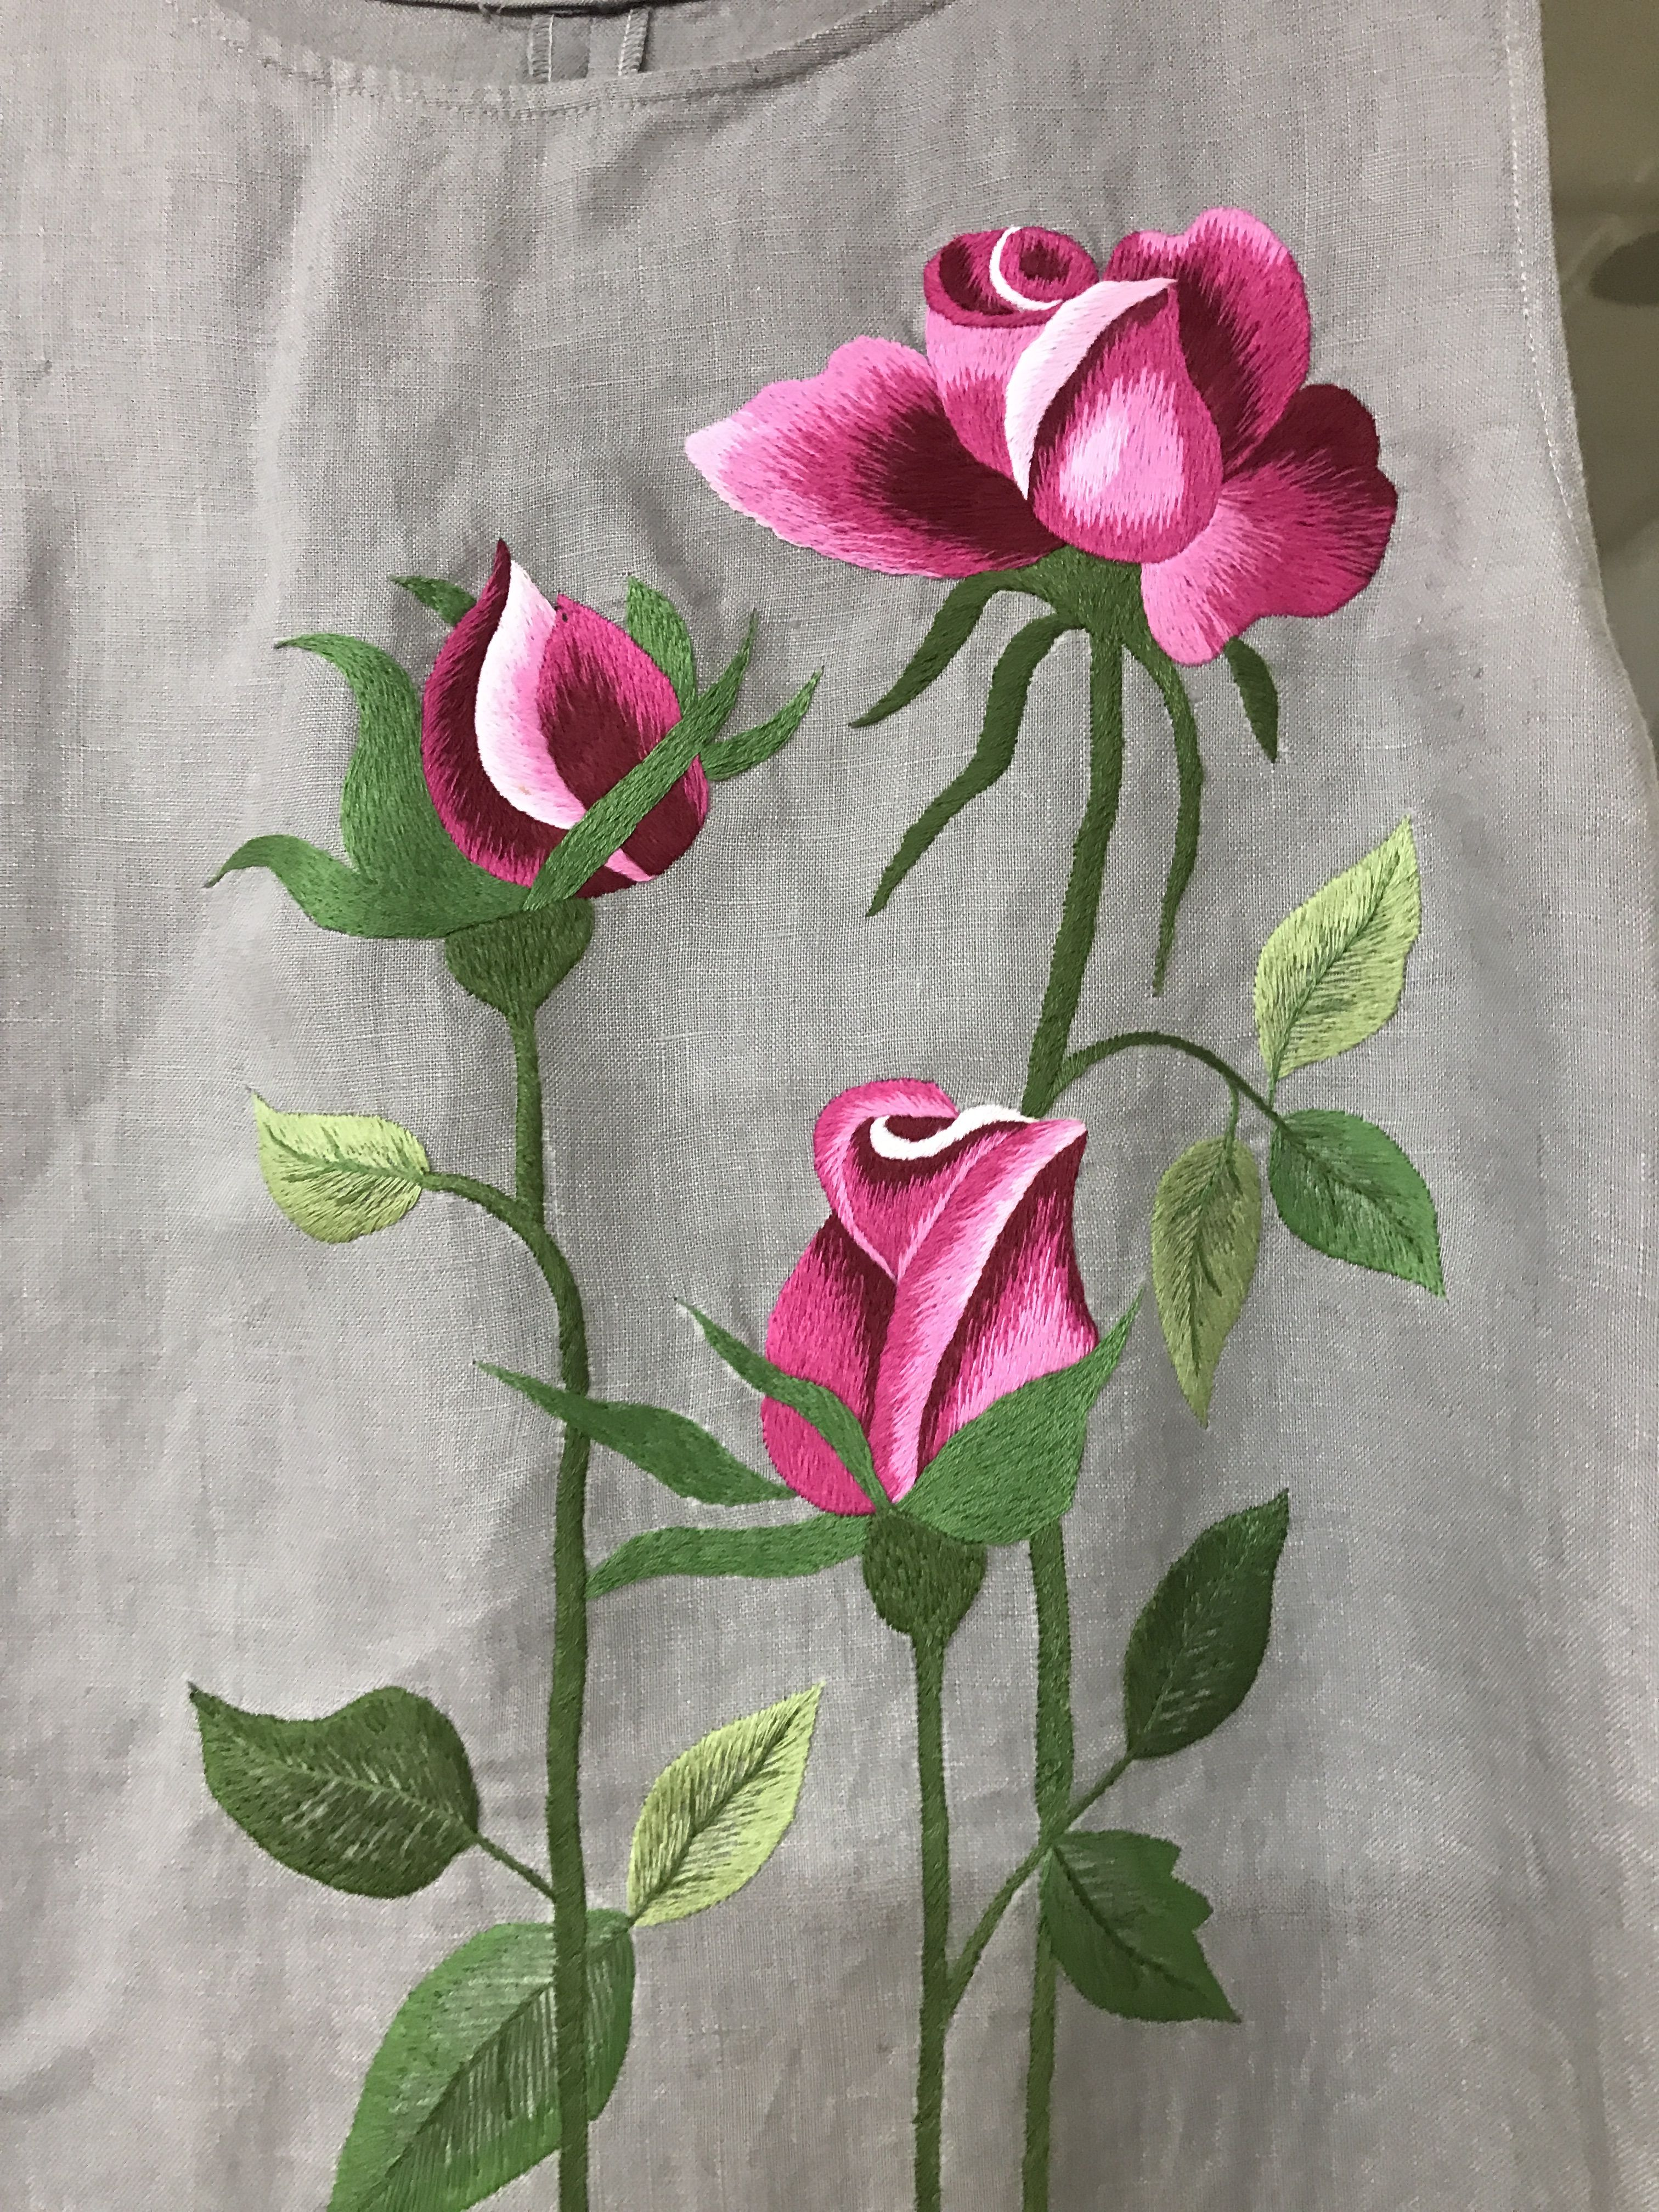 Precioso Bordado نقاشی روی لباس Pinterest Embroidery Fabric